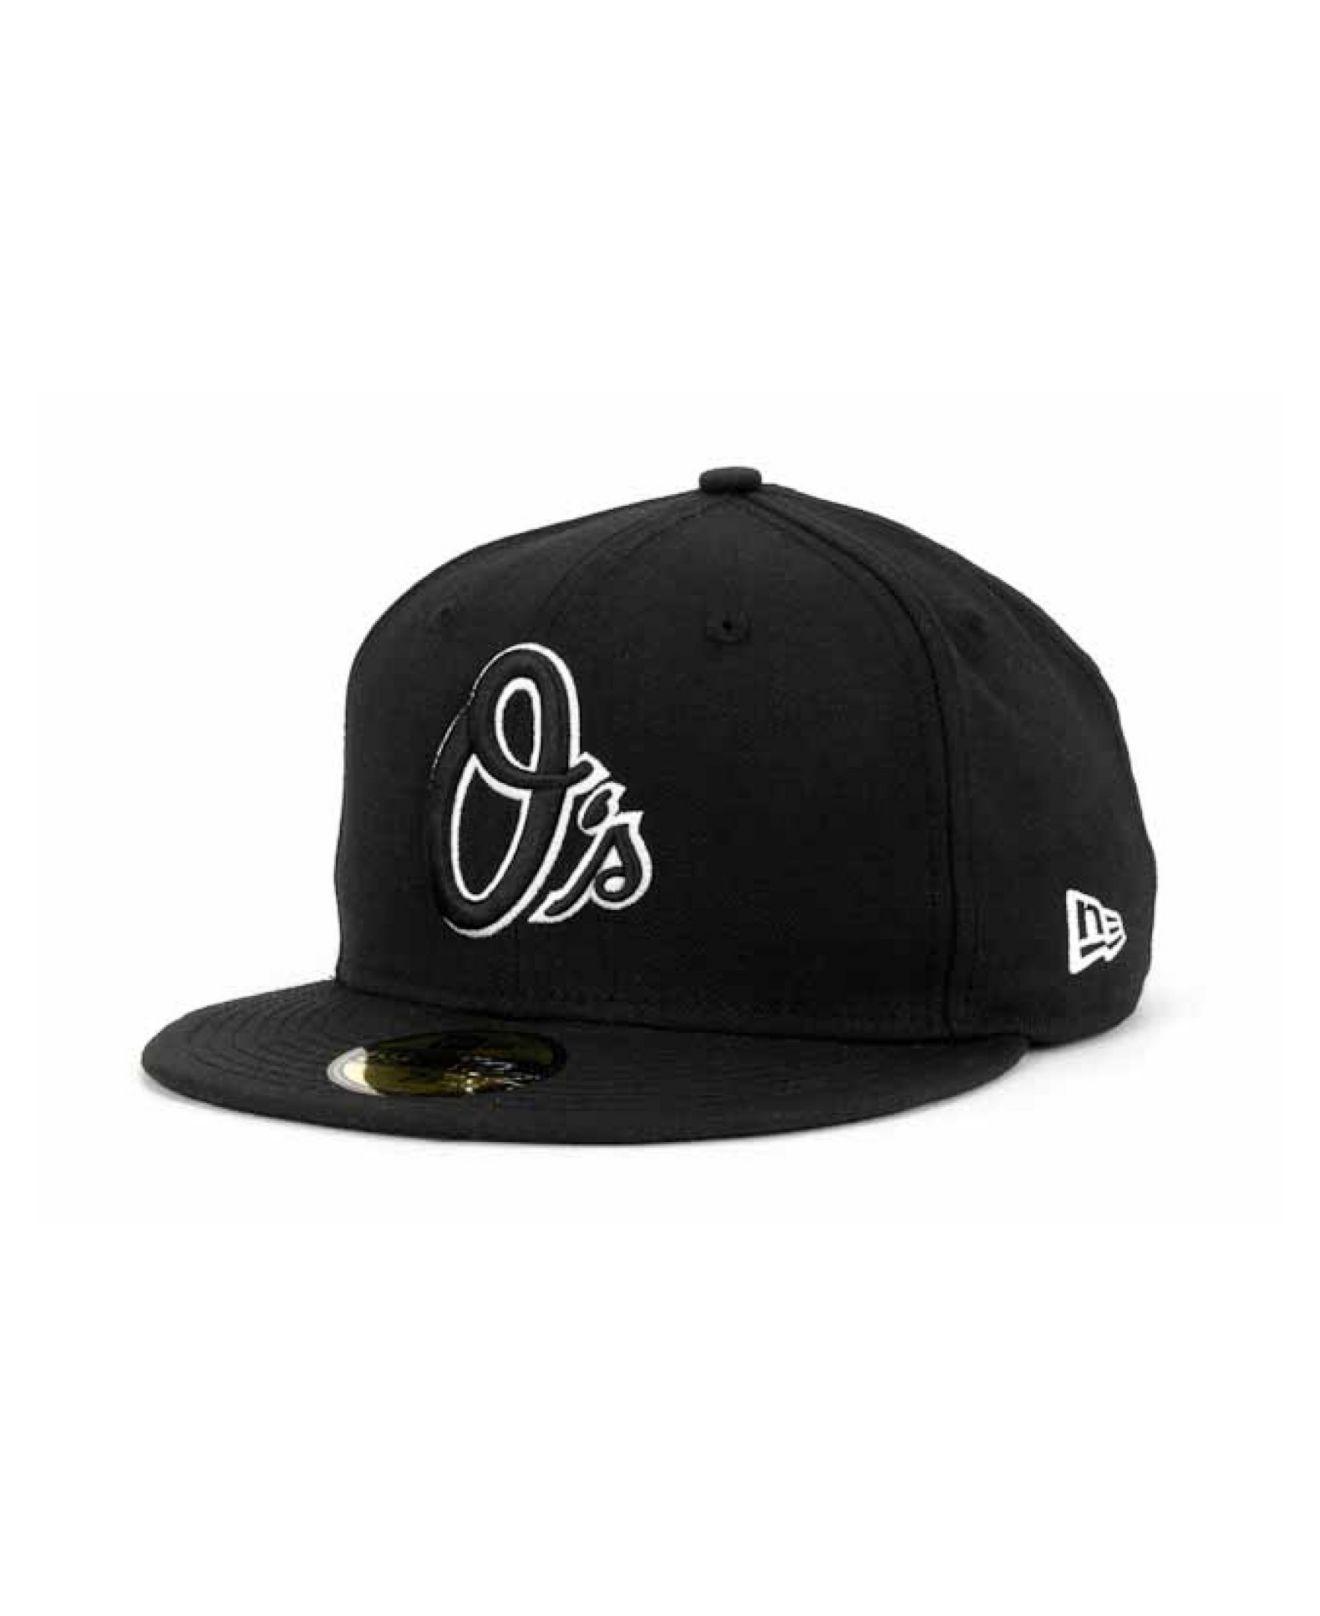 new product 843de 66592 KTZ. Men s Baltimore Orioles Black And White Fashion 59fifty Cap